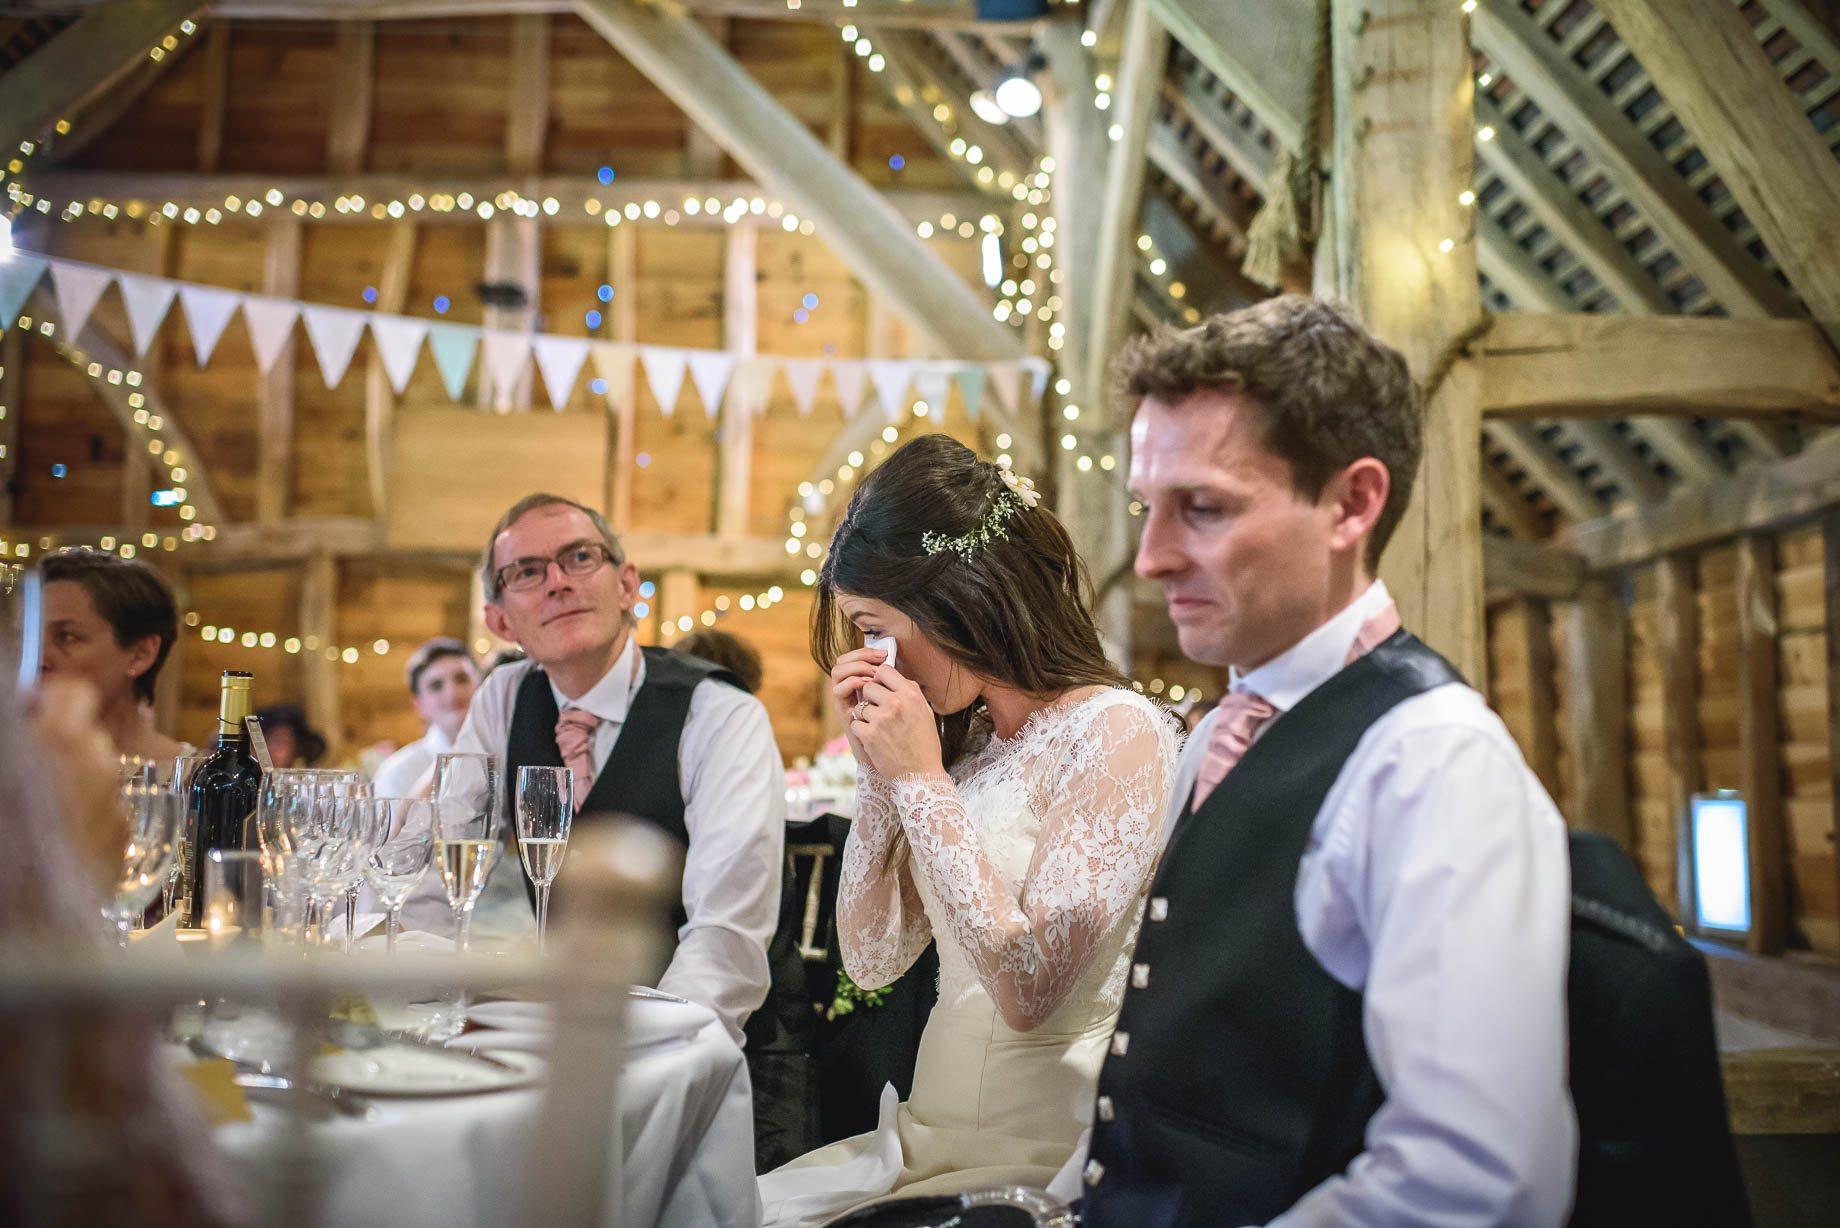 Gildings Barn wedding photography - Sarah and Steve (144 of 190)